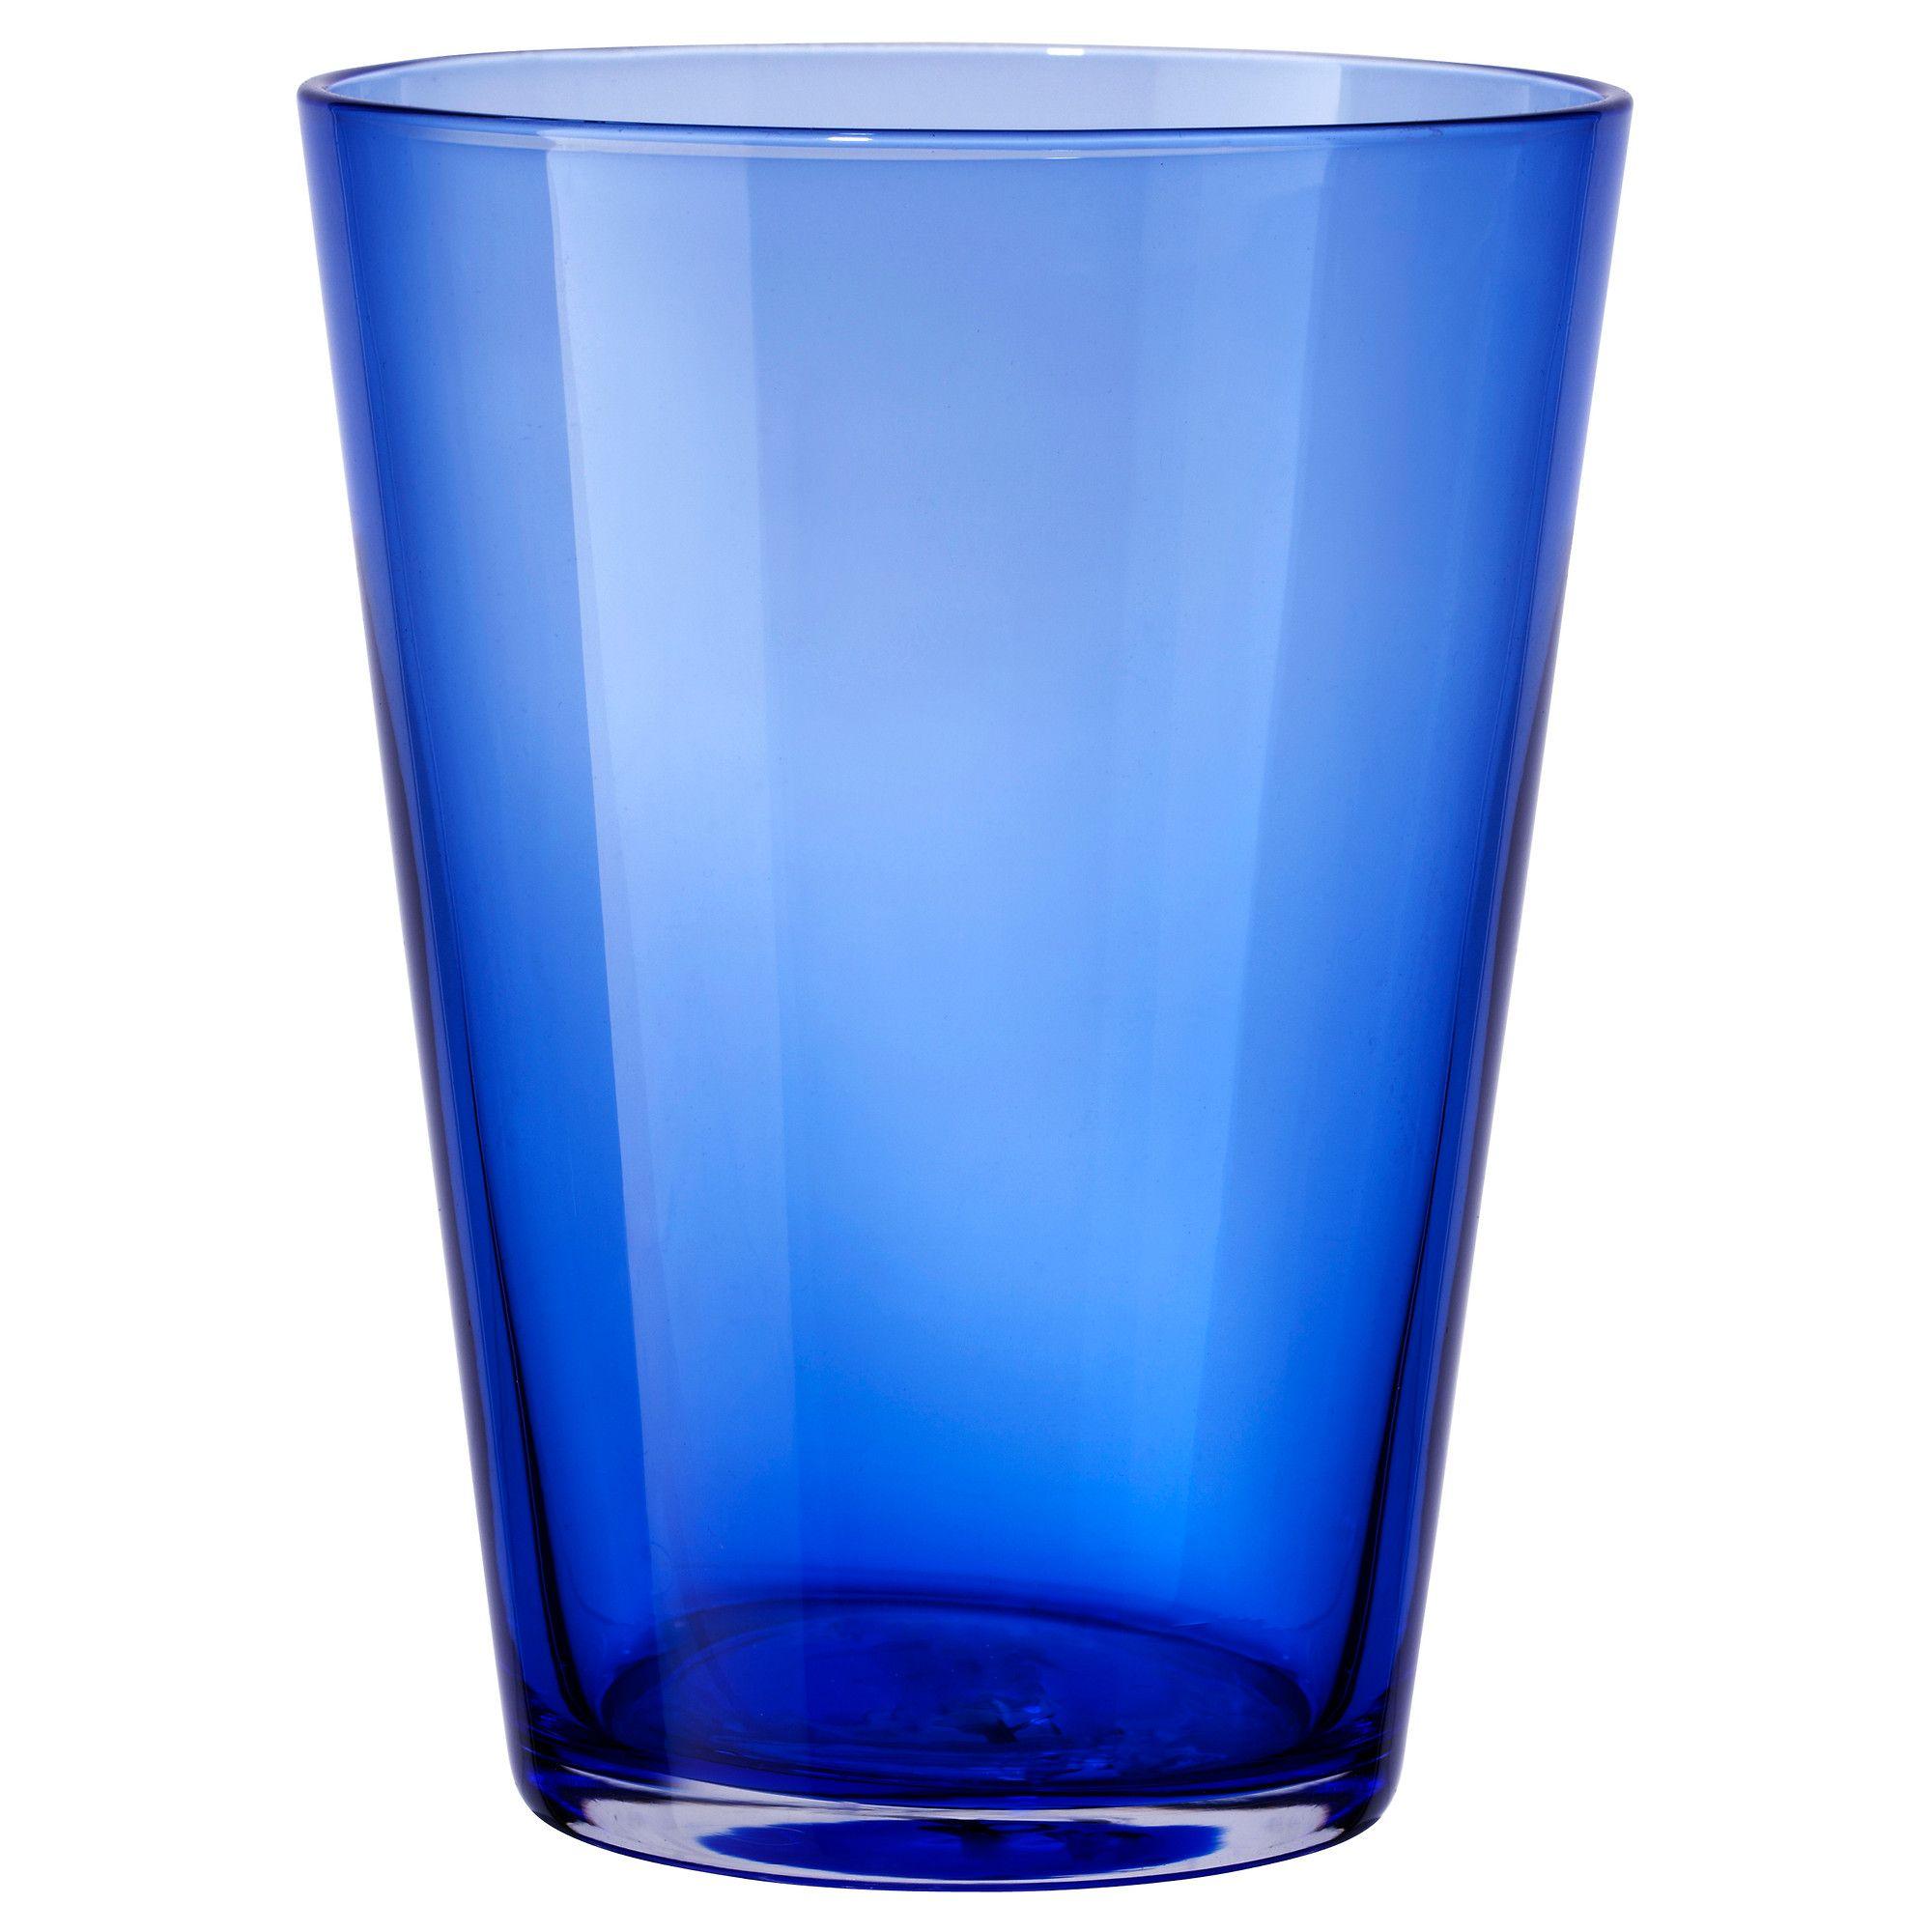 Cobalt Blue Glass Ikea $299  Dining Room  Pinterest. Kitchenaid Oven Reviews. Kitchen Backsplash Glass Subway Tile. Dream Kitchens Oregon Wi. Kitchen Design Quartz Countertops. Rustic Kitchens On A Budget. Kitchen Lighting To Replace Fluorescent. Kitchen Floor How To. Kitchen Corner Nook